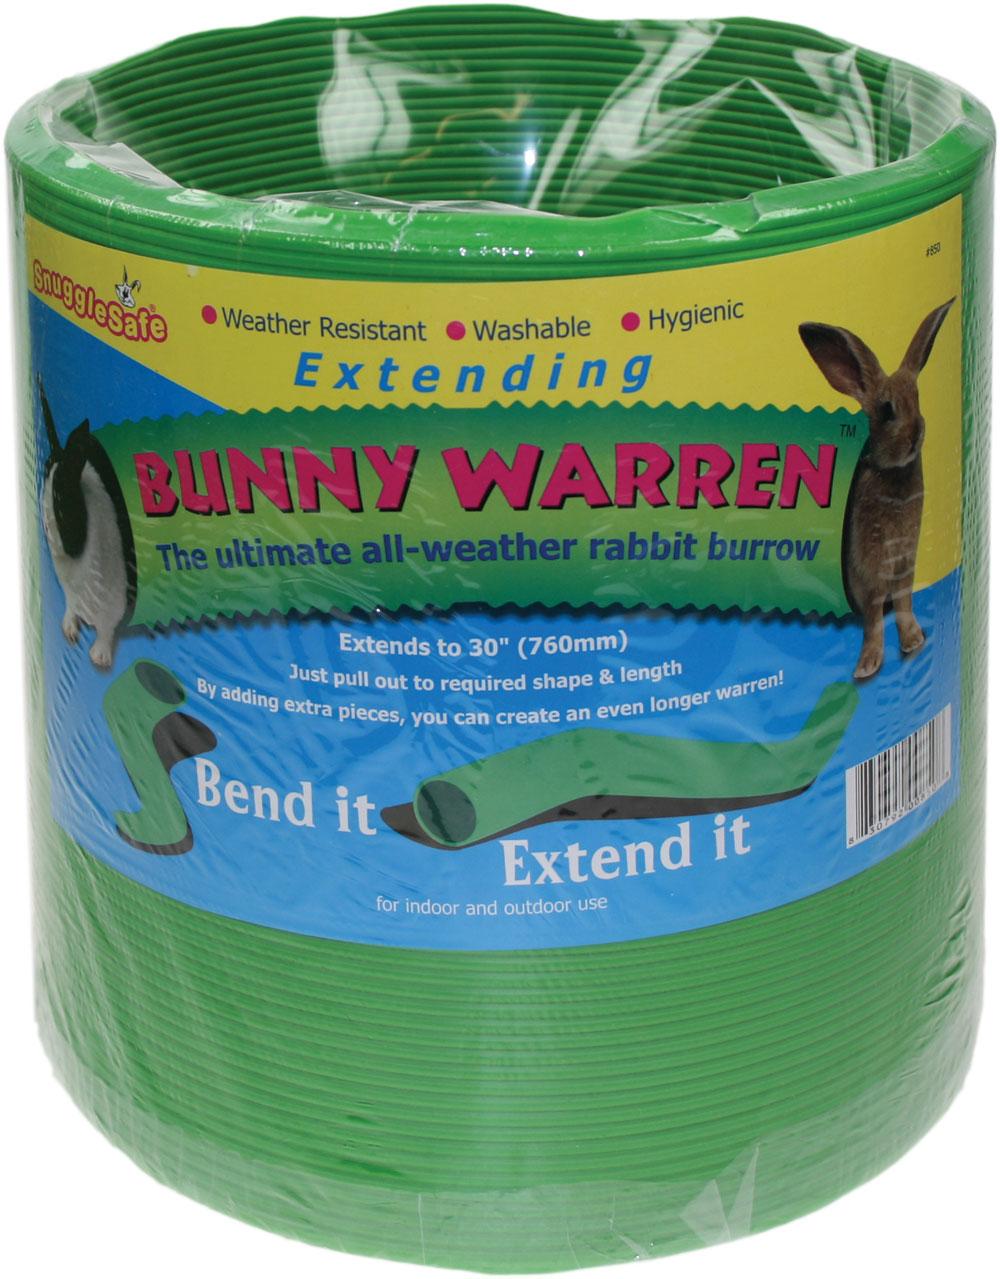 Snugglesafe Extending Bunny and Guinea Pig Warren   Rabbit Toys   Rabbit Products   Omlet